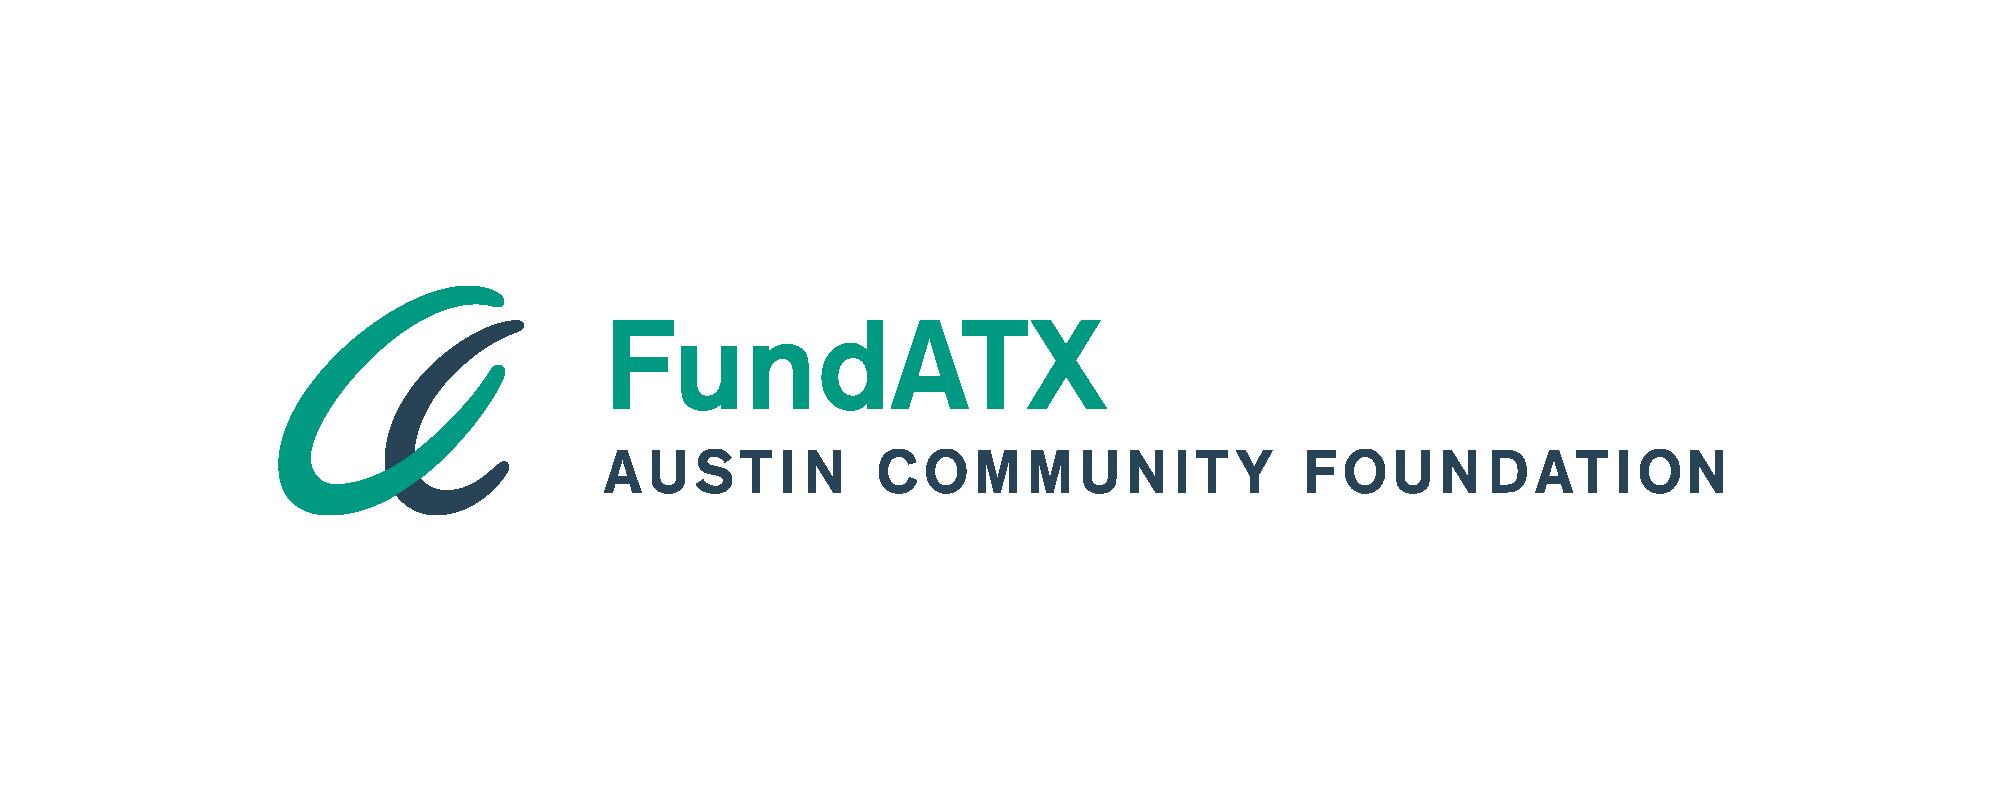 funatx-logo.png